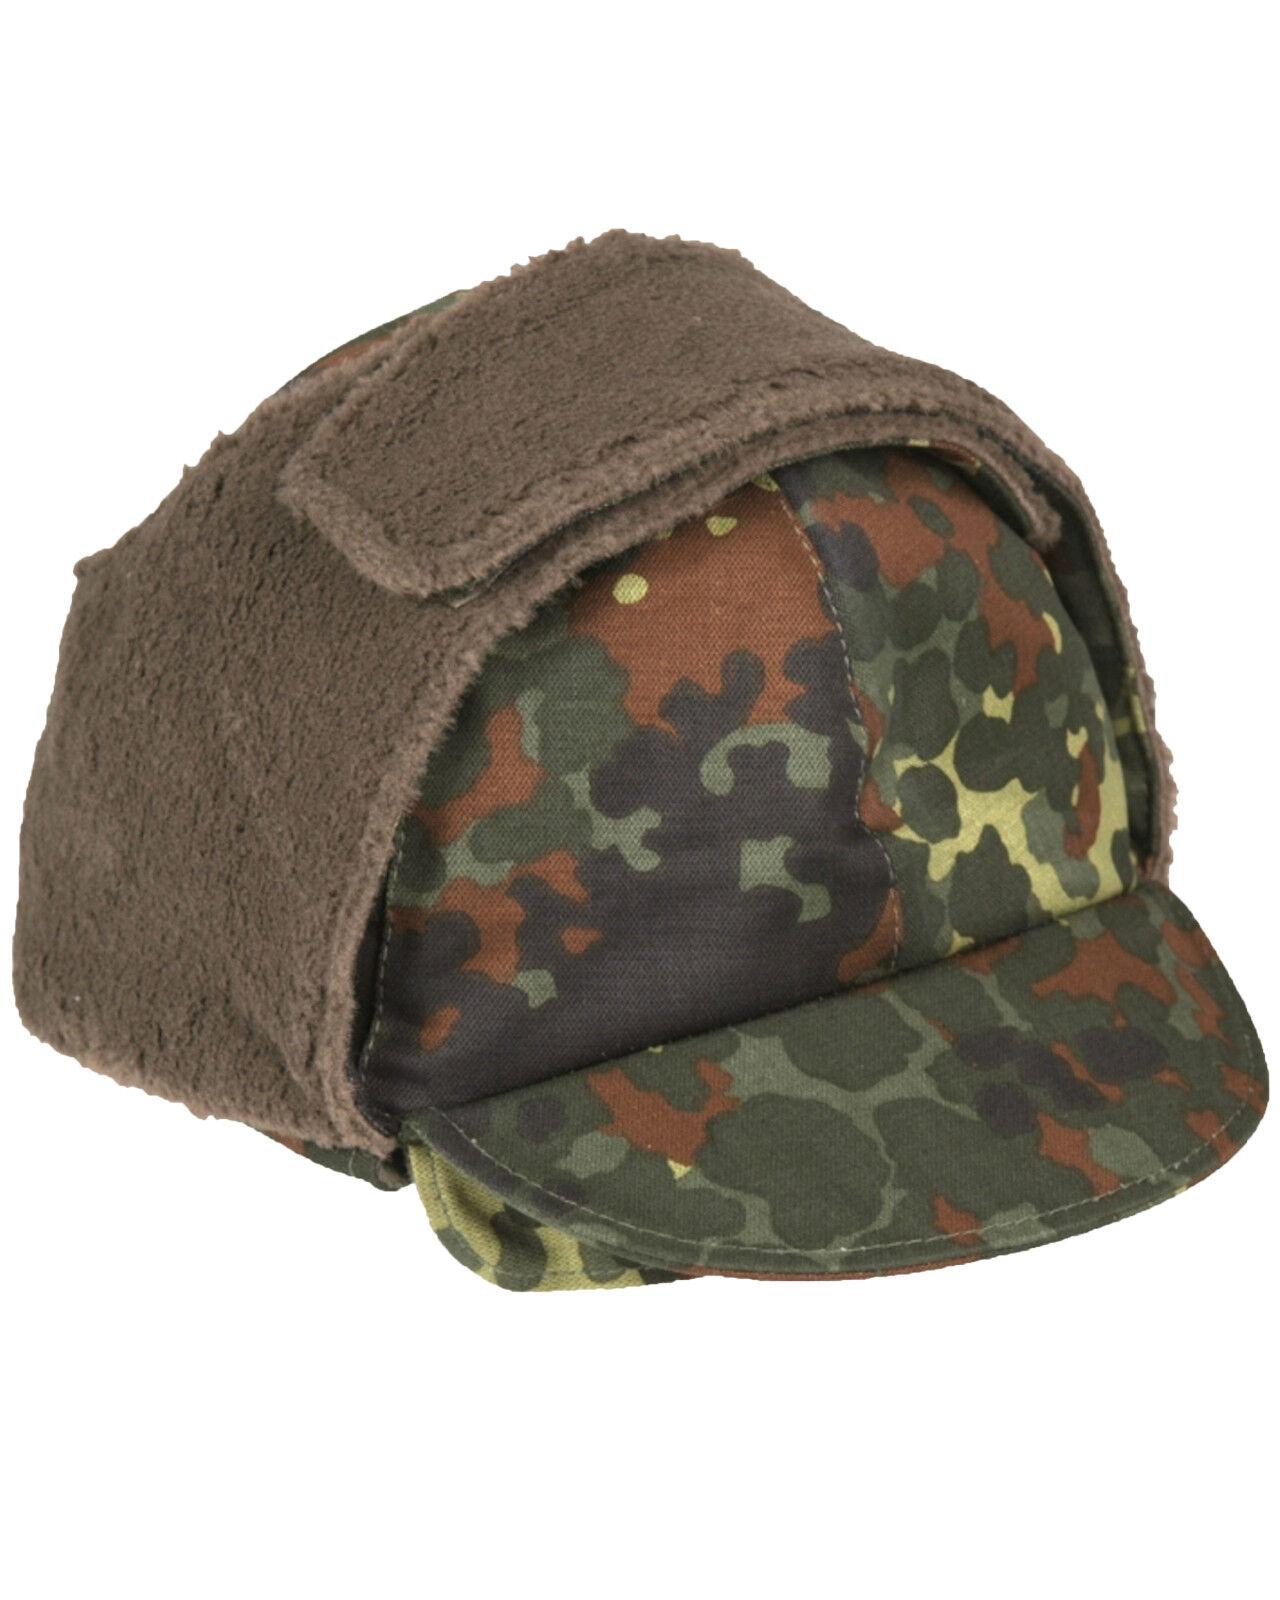 afa256339a0e2b Details about Genuine German Army Issued Bundeswehr Flecktarn Camo Winter  Pile Cap Hat Grade 1